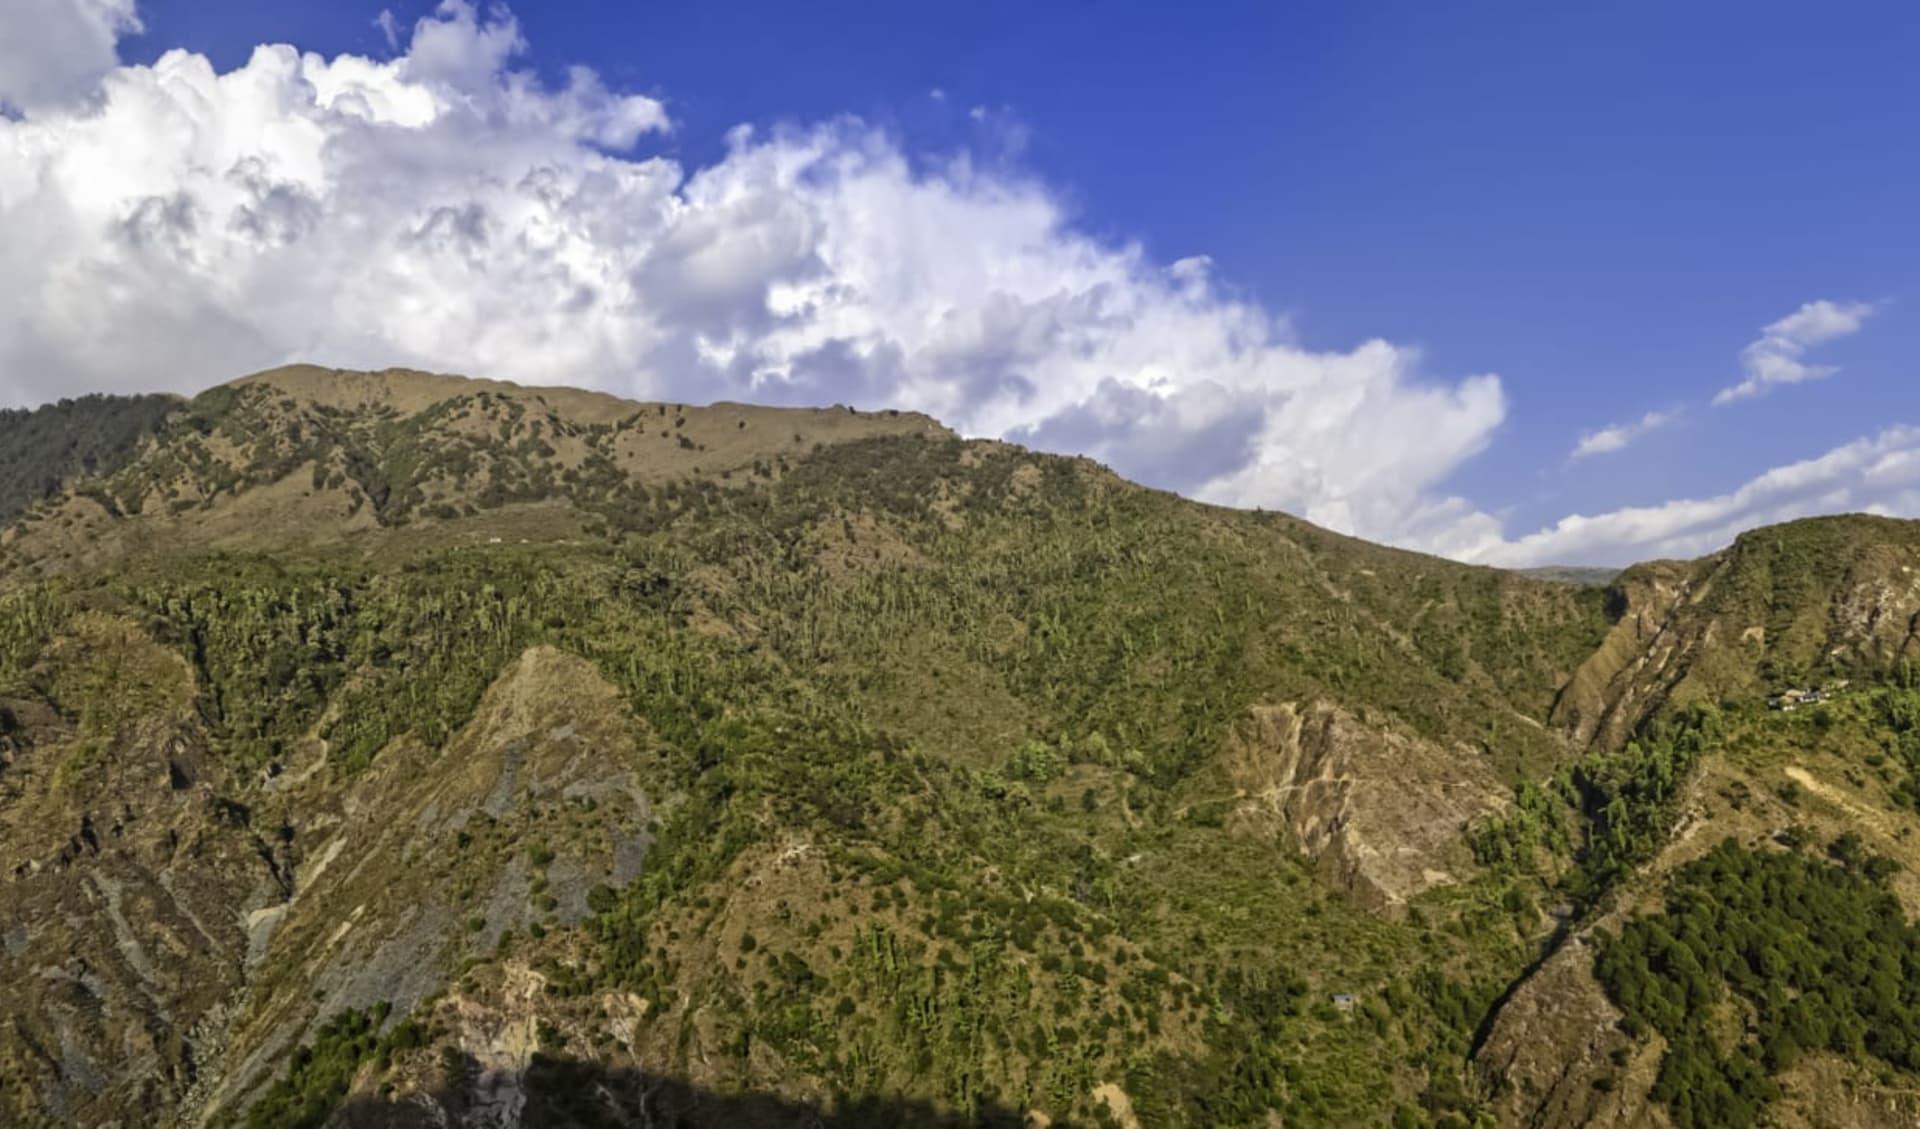 Himachal Pradesh & Ladakh ab Delhi: Dharamsala: Mountain